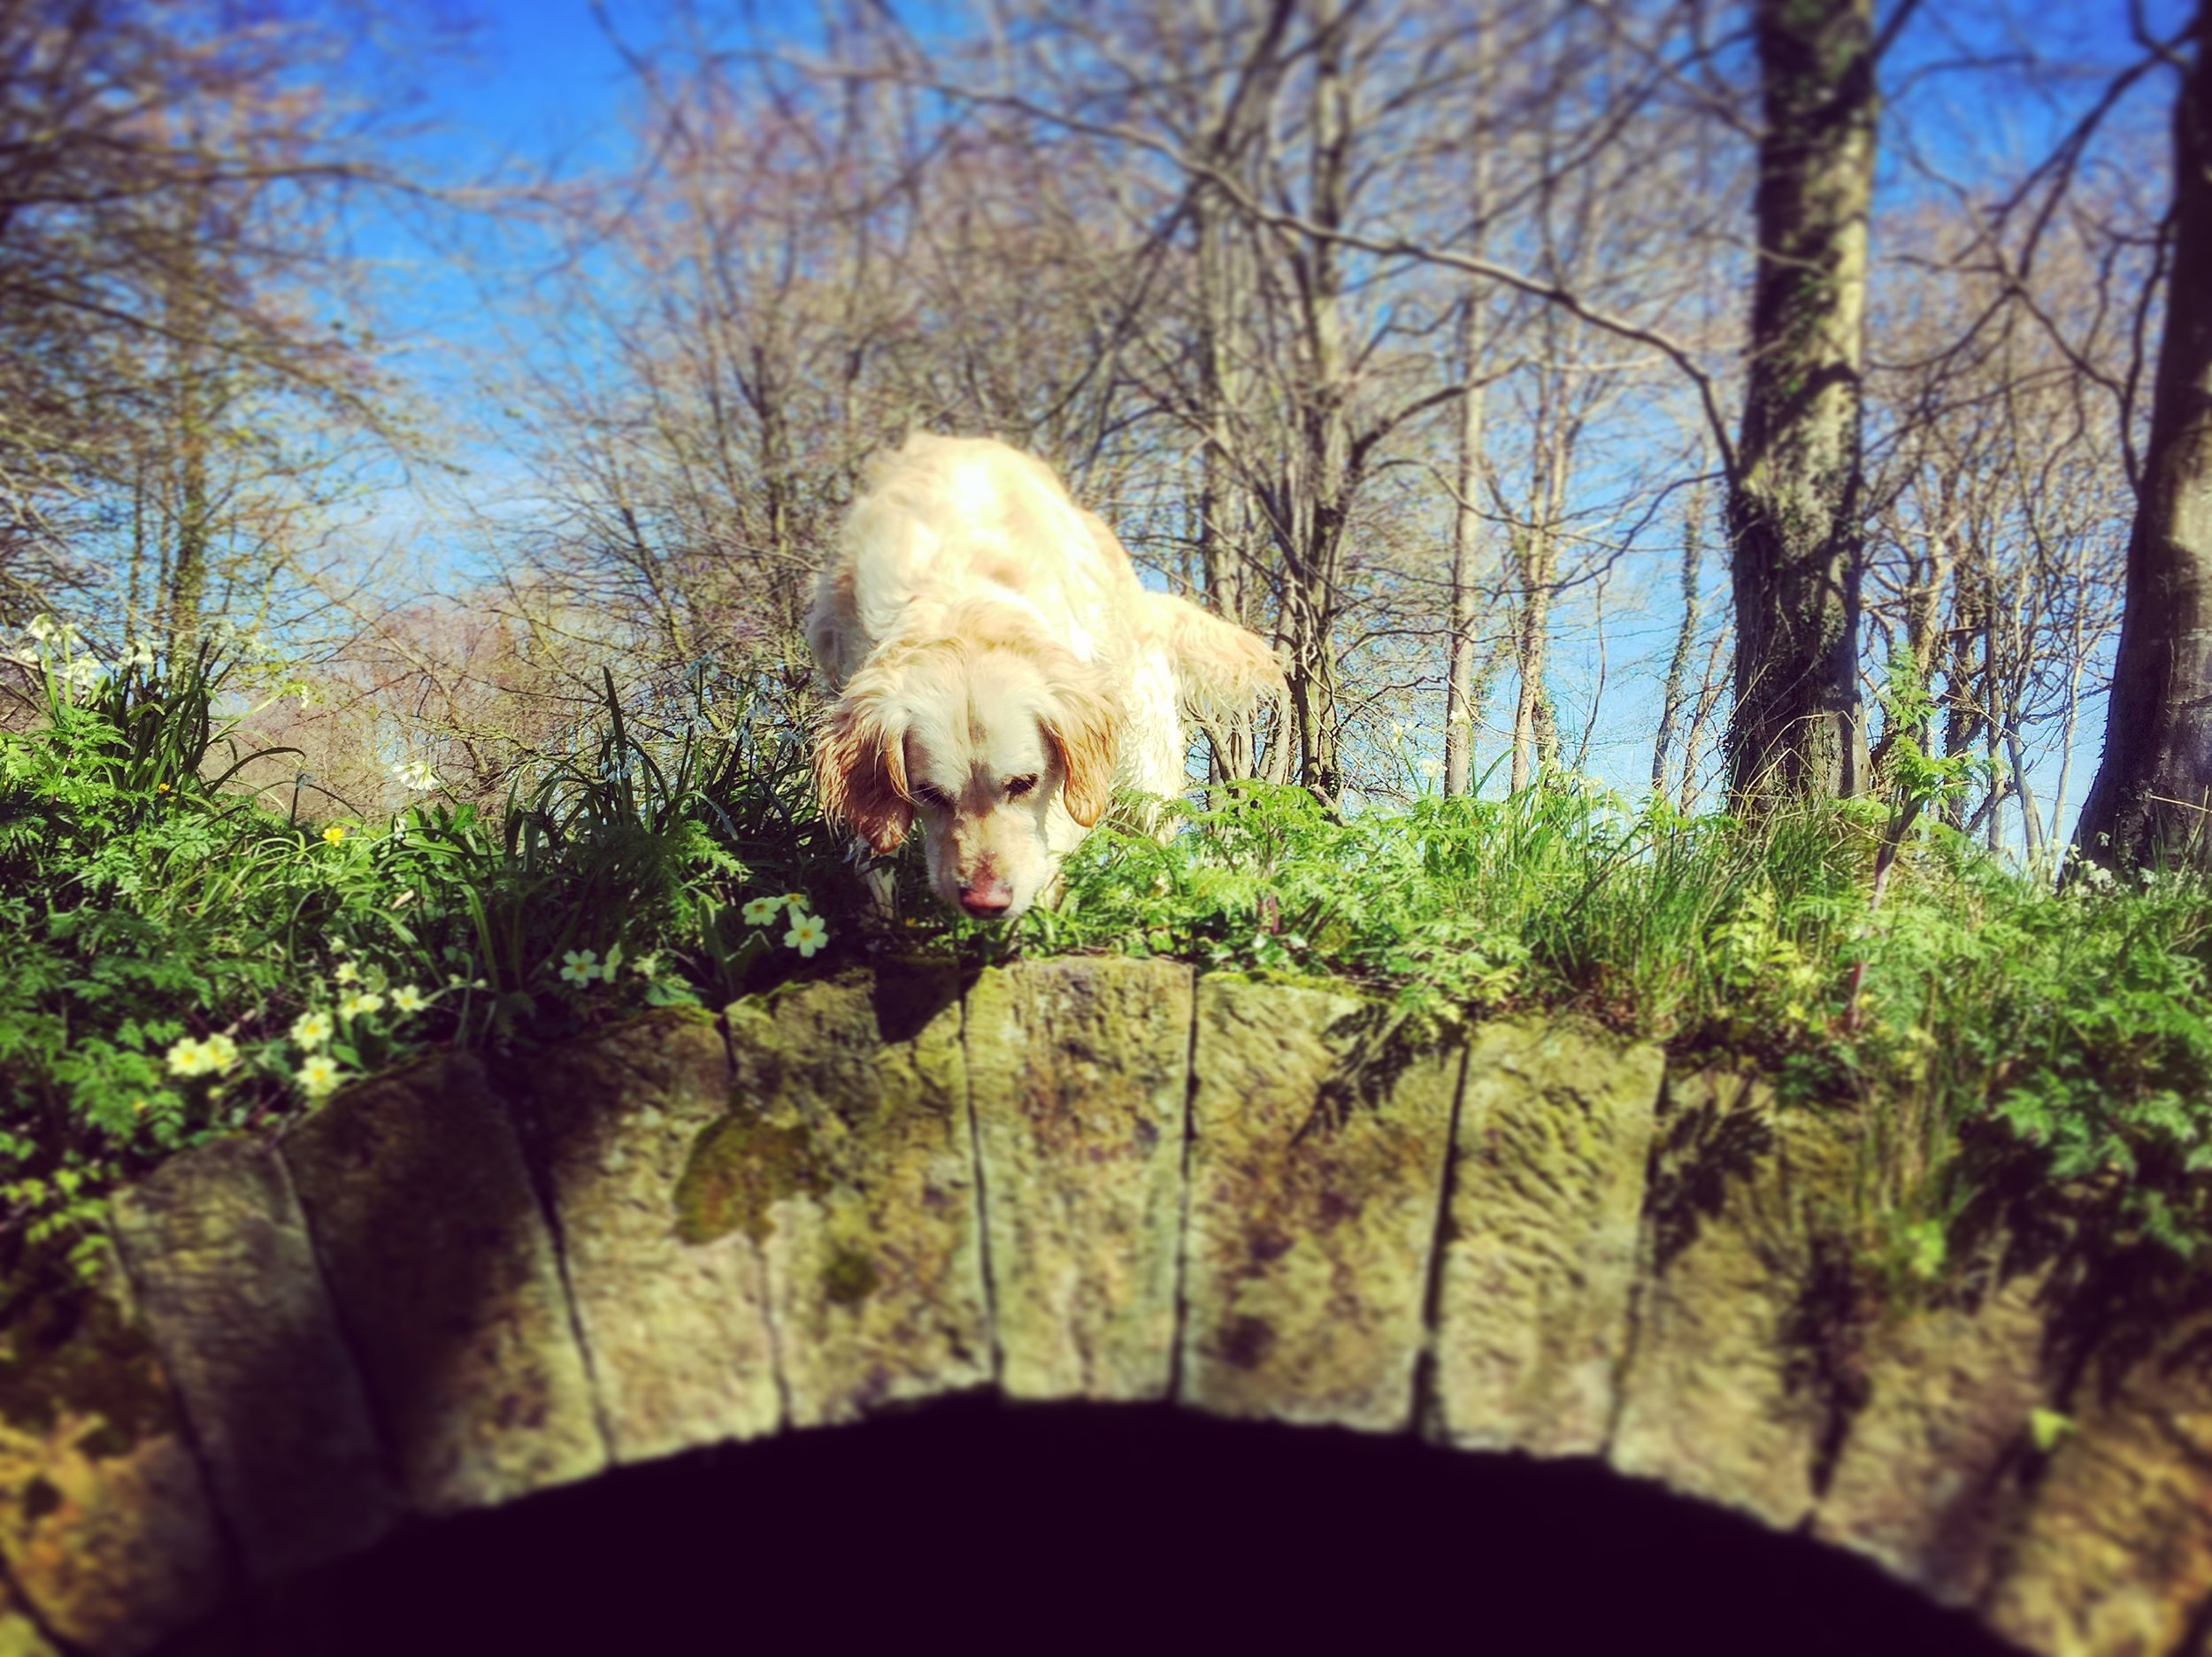 bridge_happy_dog_country_helens_bay_to_crawfordsburn_roadtrip_coast_ni_explorer_niexplorer_northern_ireland_blog.jpg